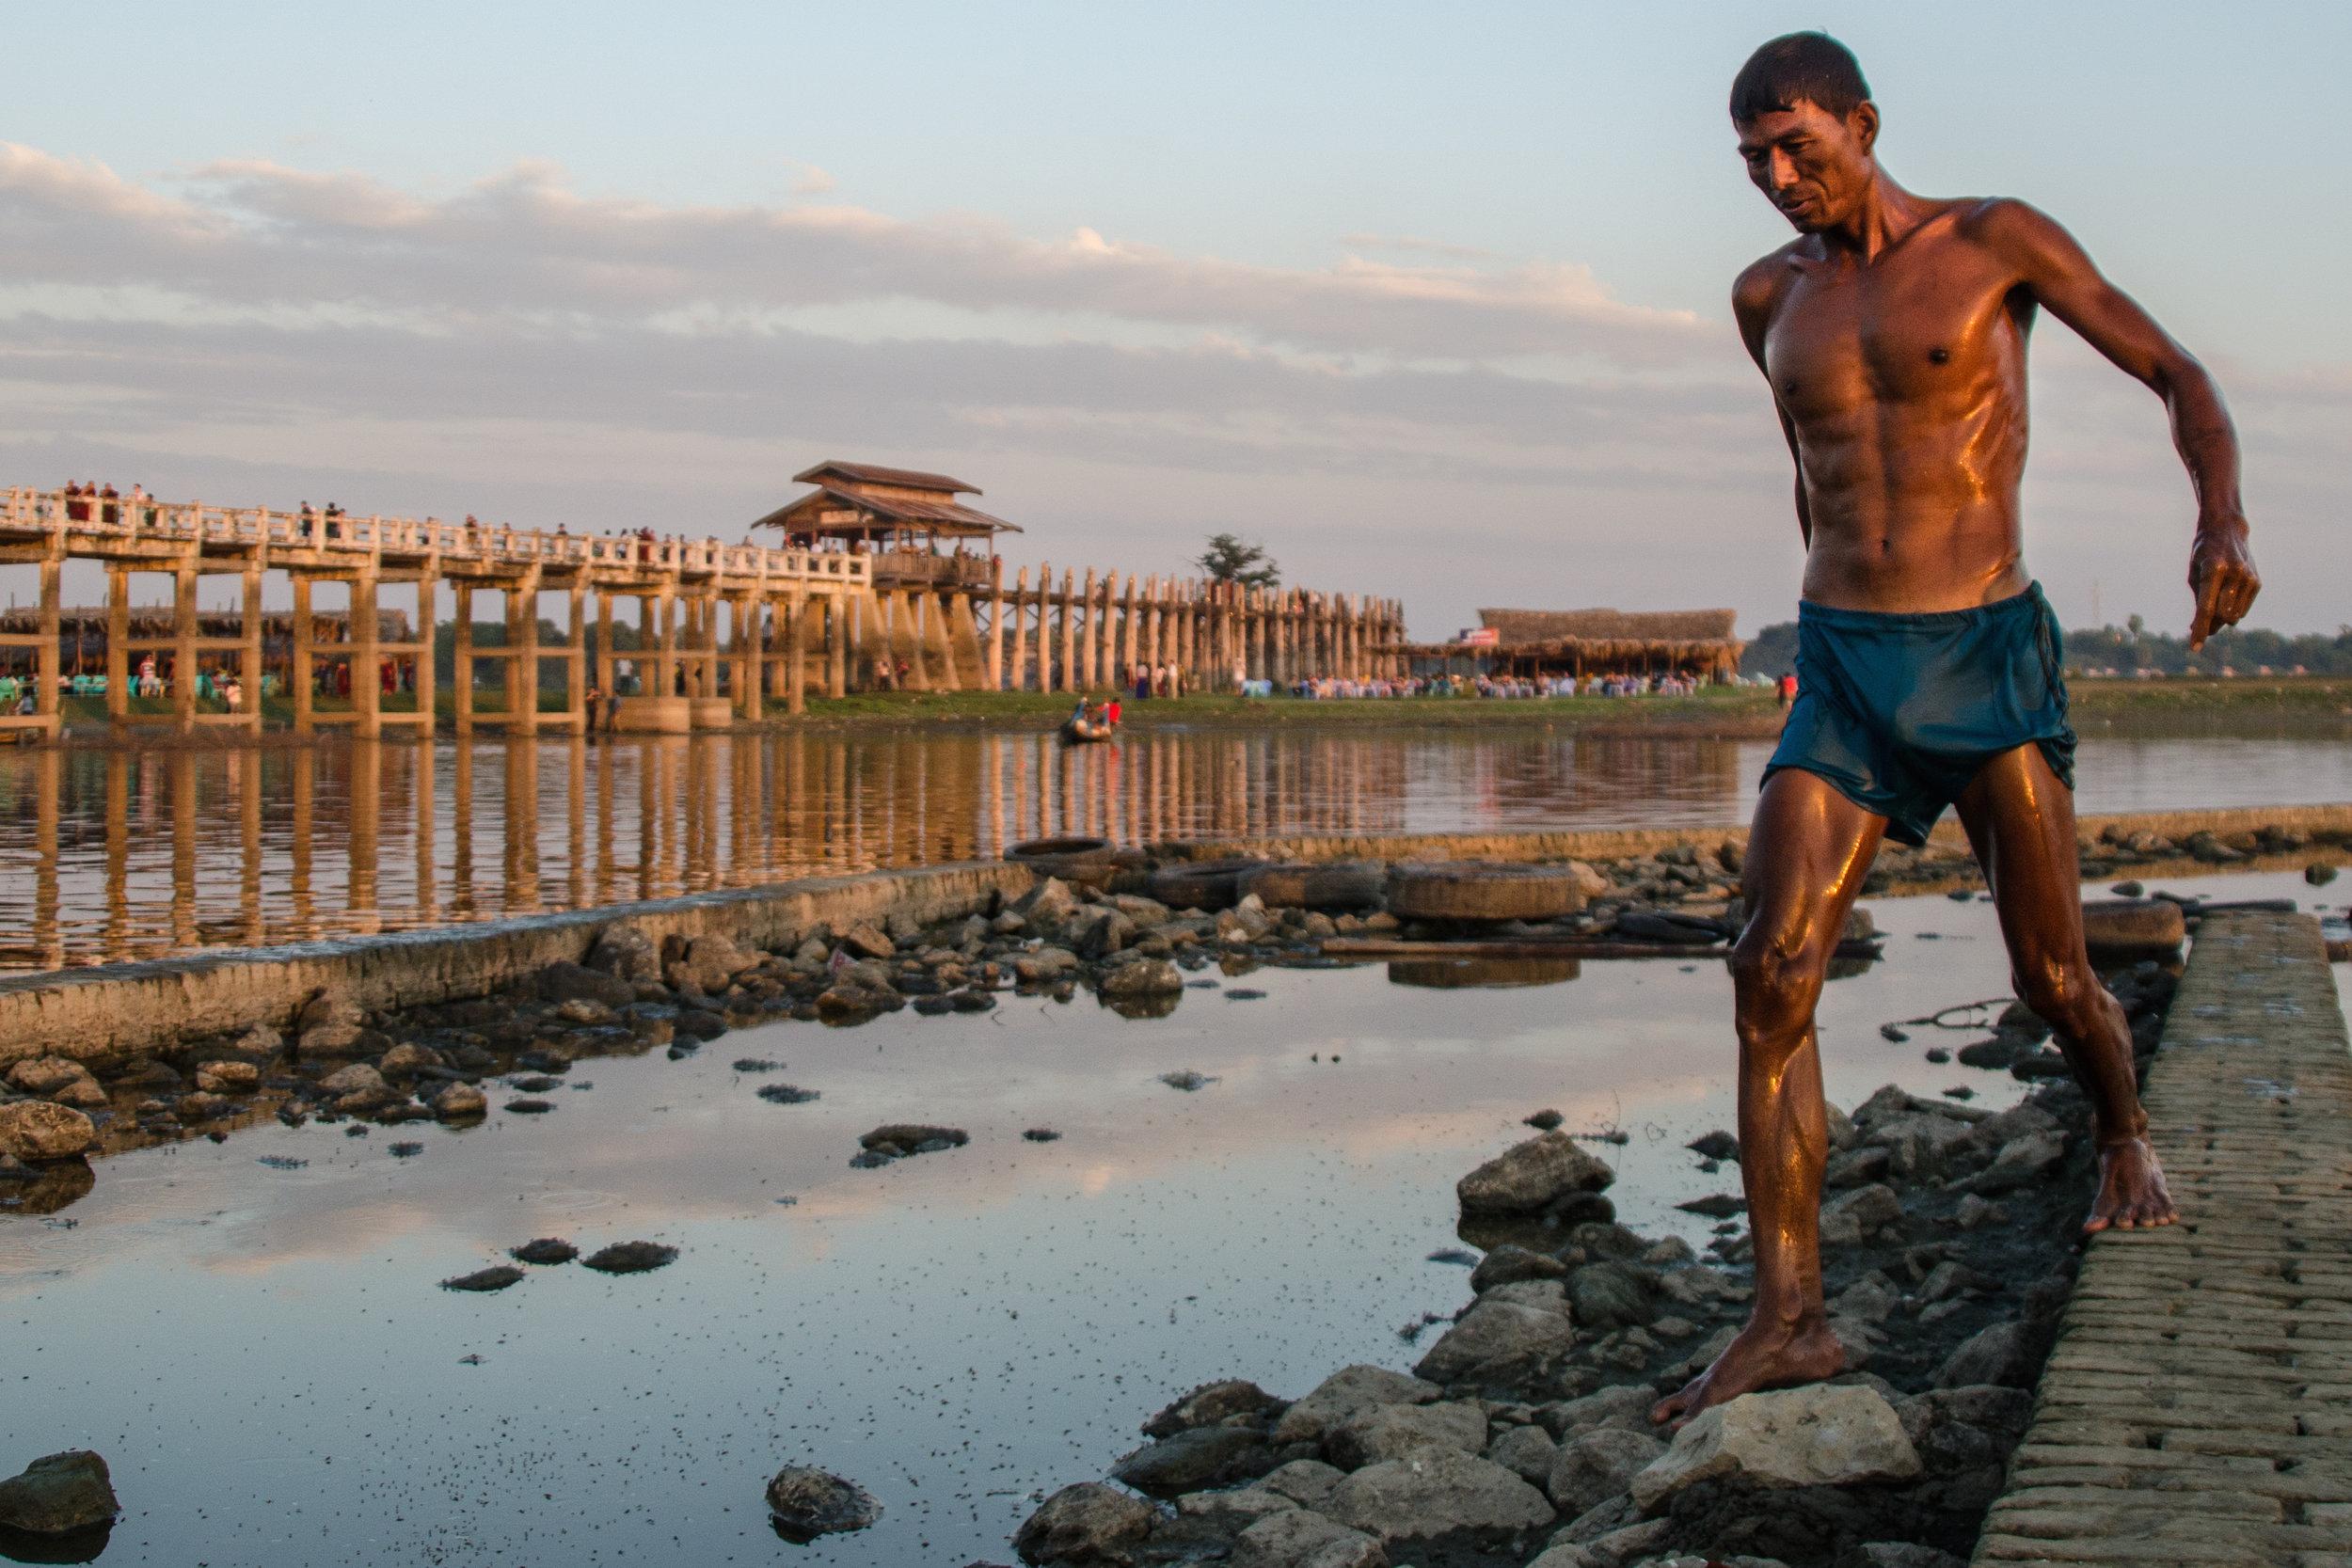 U Bein Bridge, Mandalay, Myanmar 20mm f4 1/500